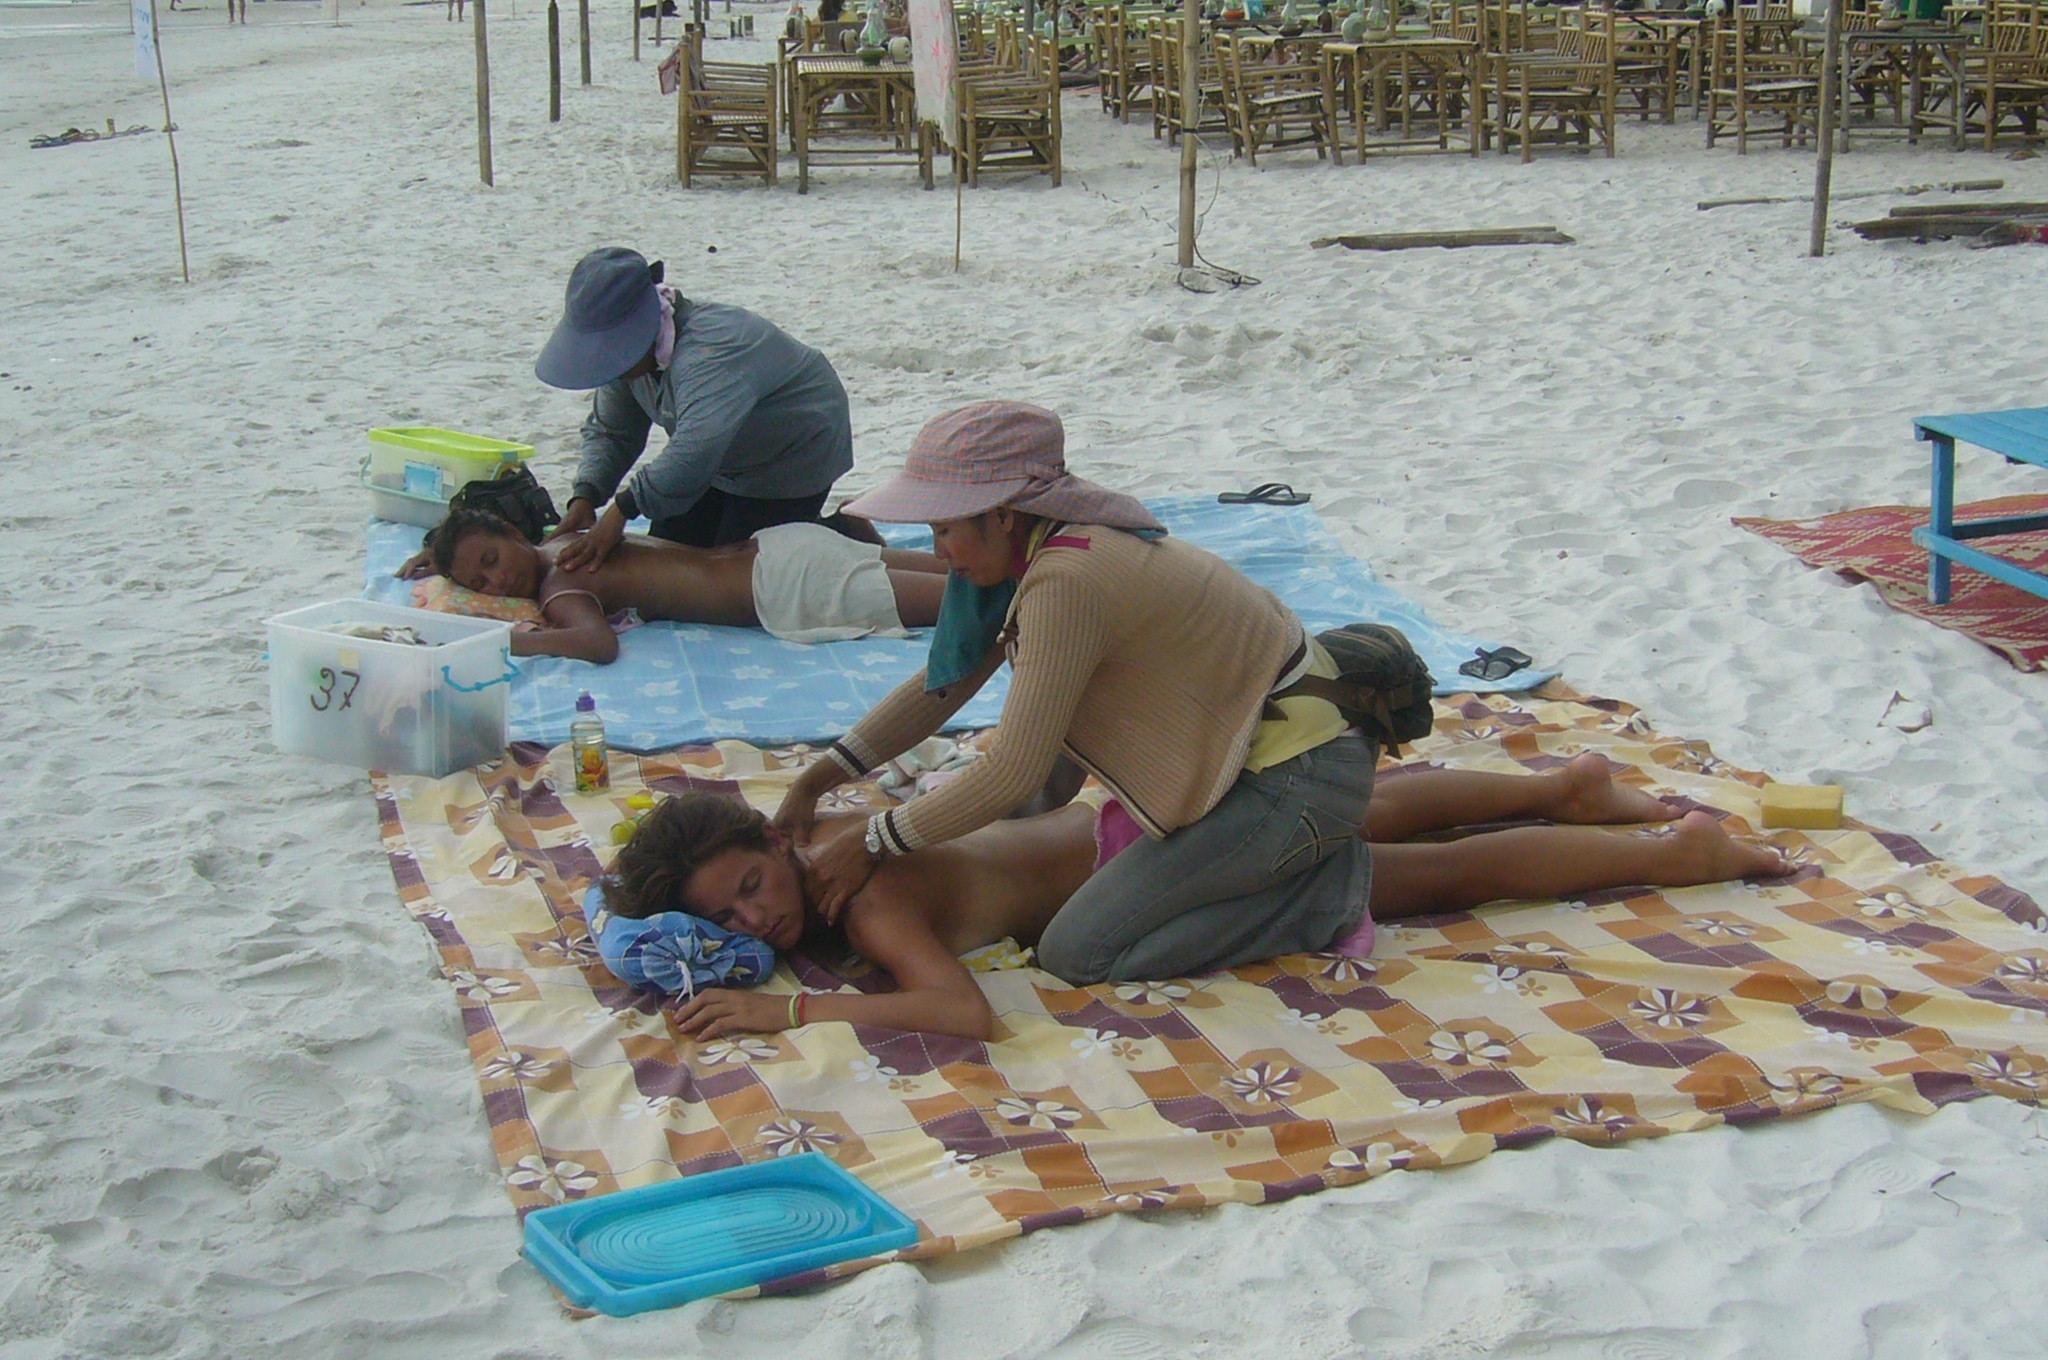 ko massage gratis poor film